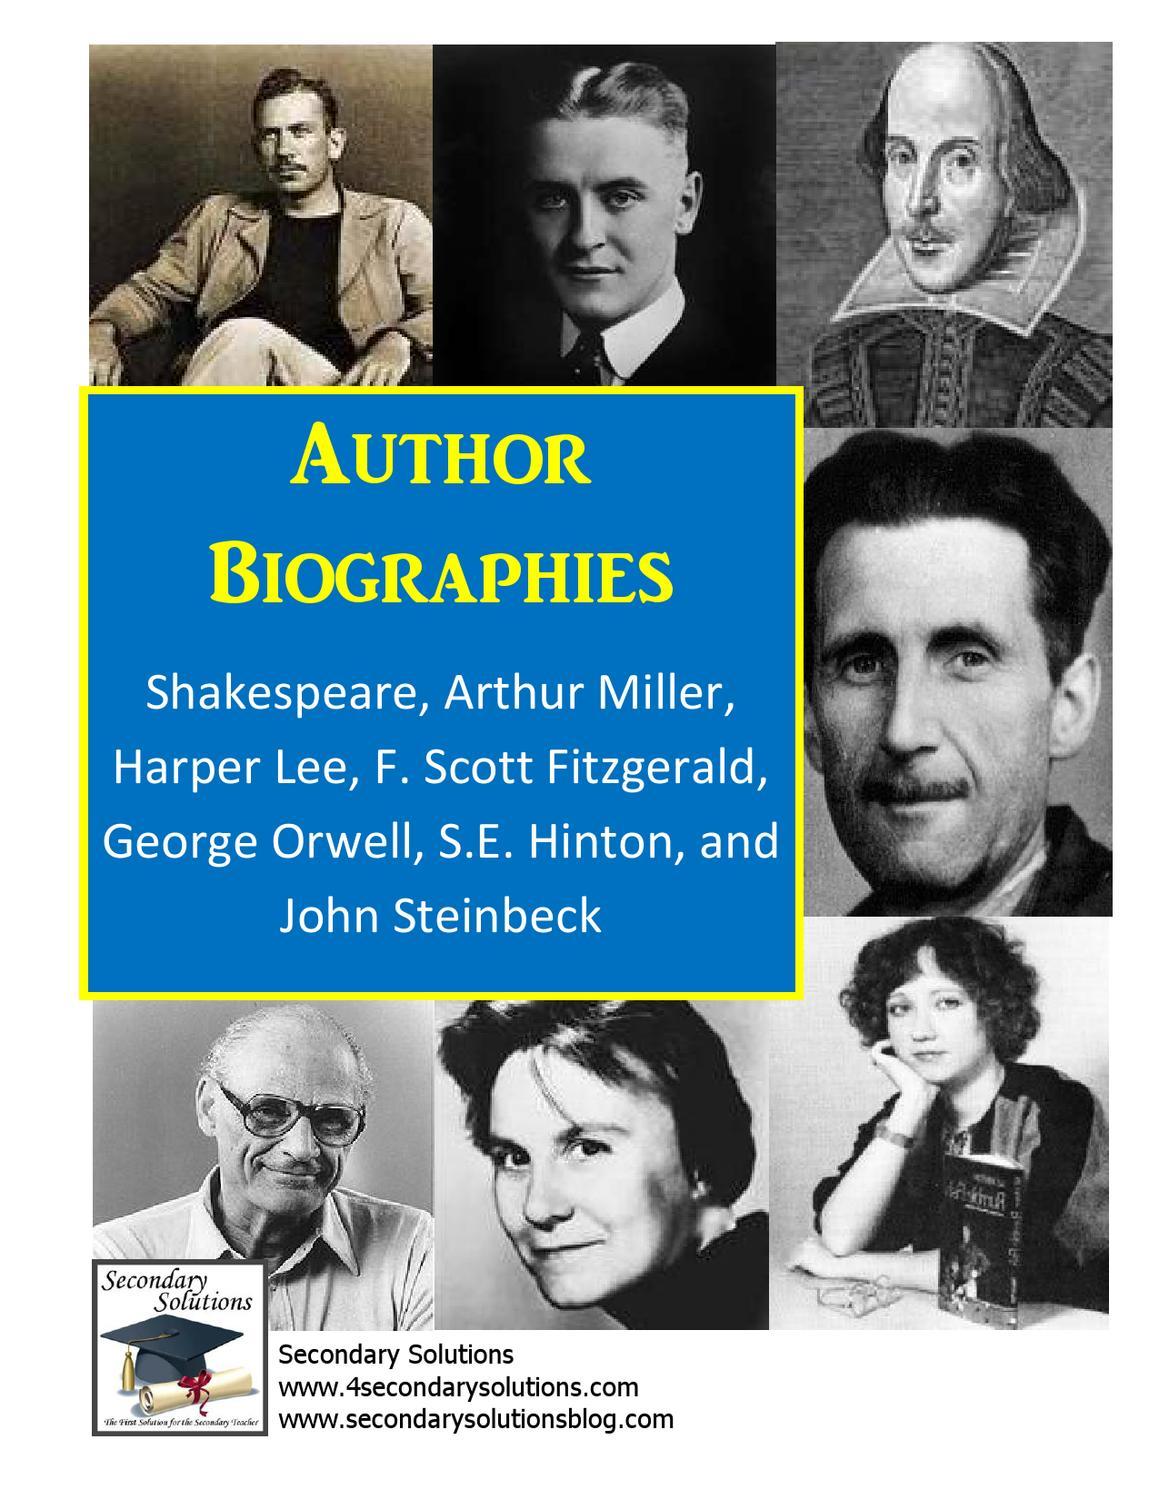 John steinbeck biography essay